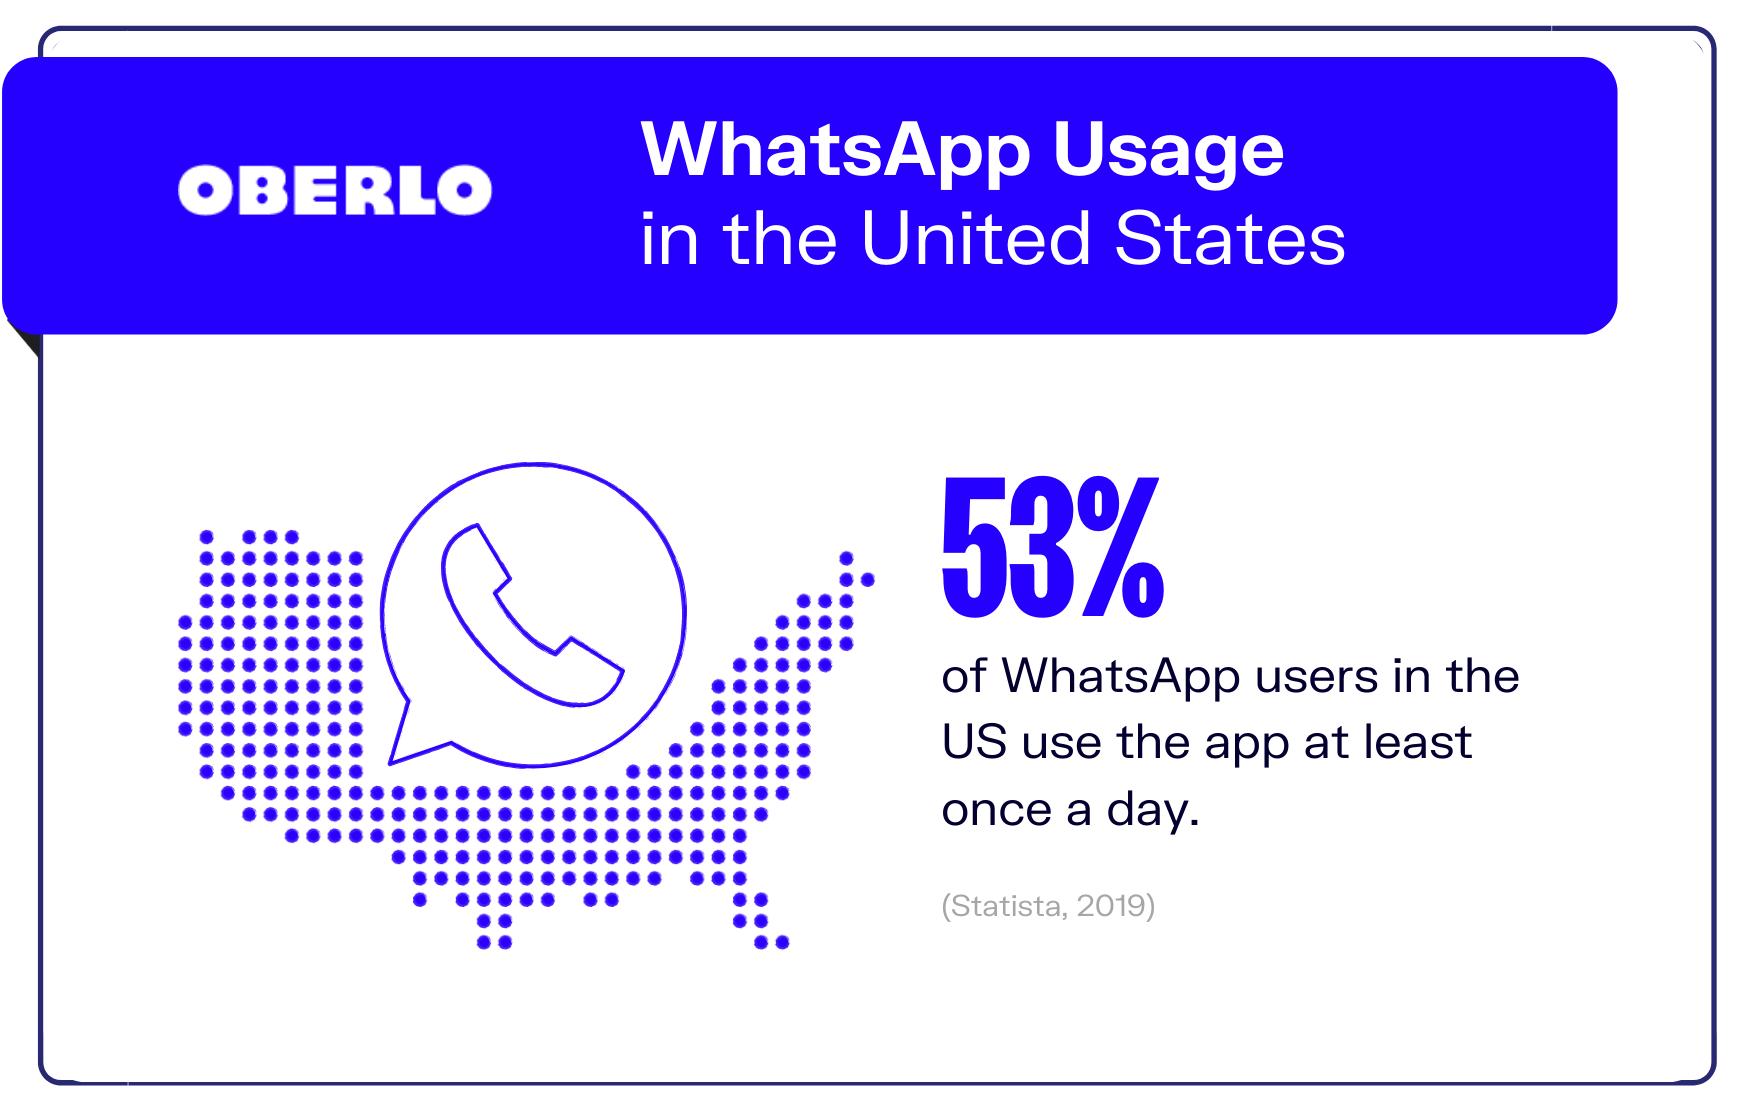 graphic of whatsapp statistic #7